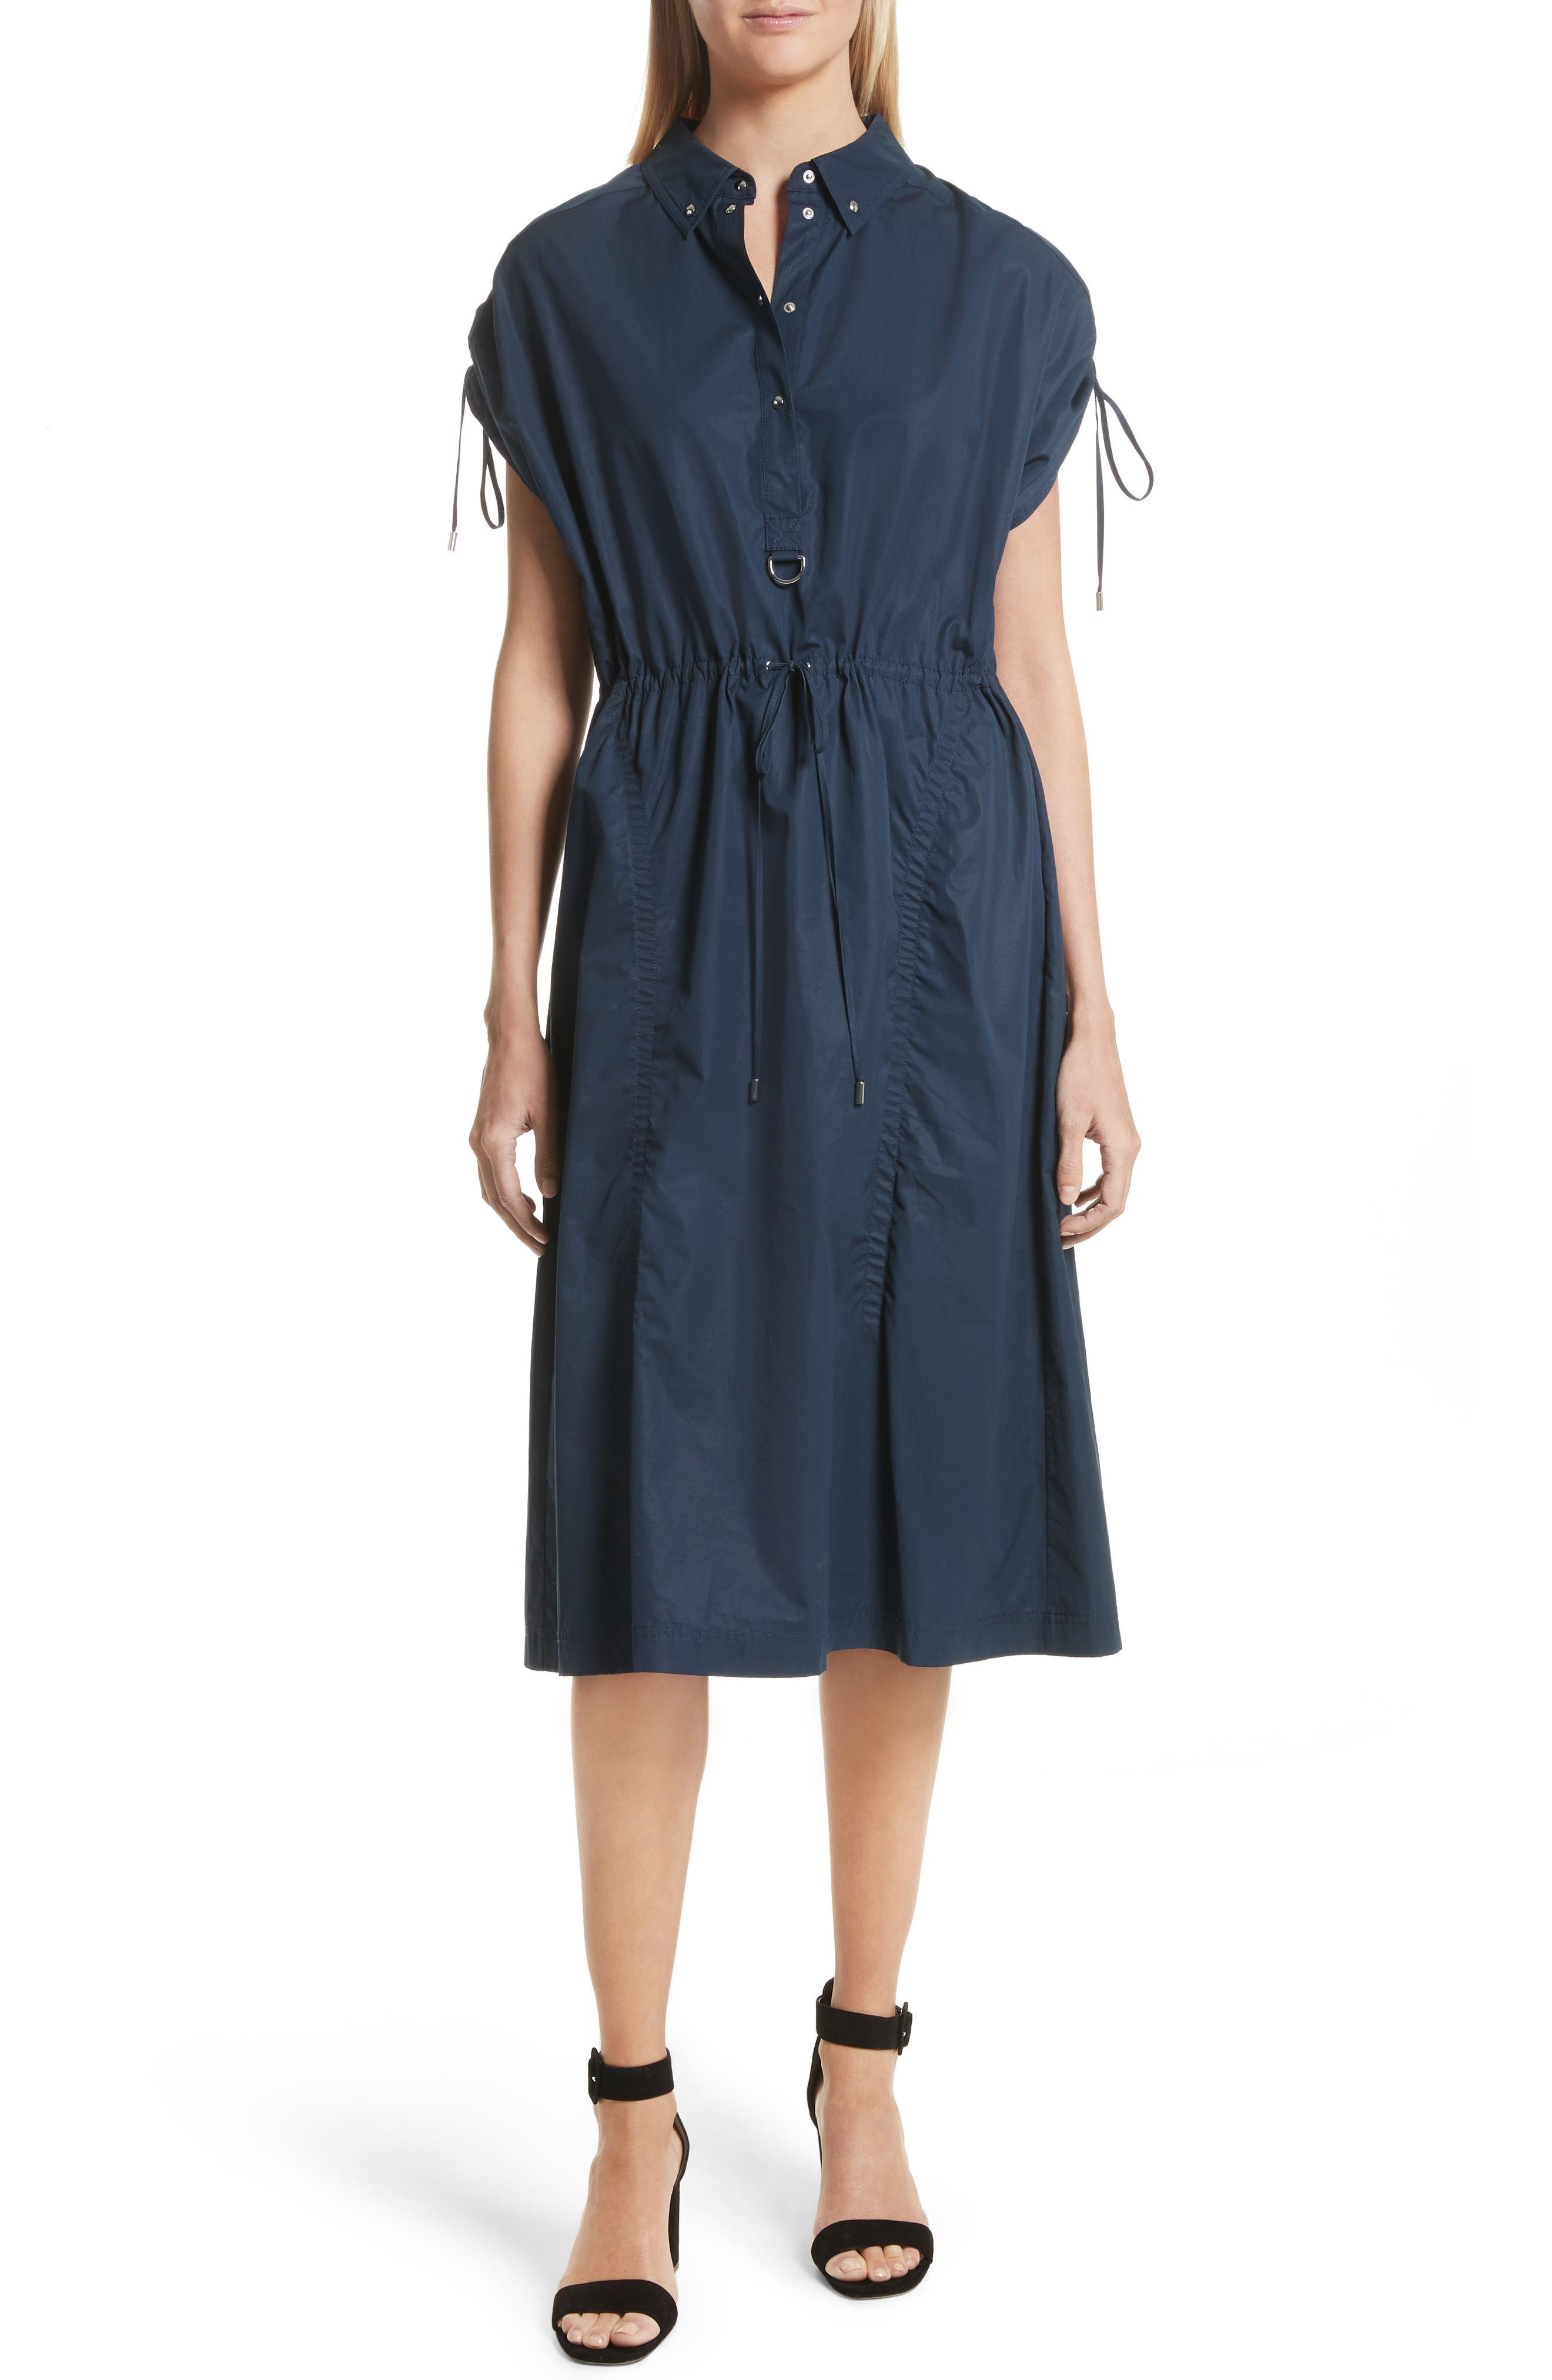 GREY Jason Wu Cotton Poplin Dress